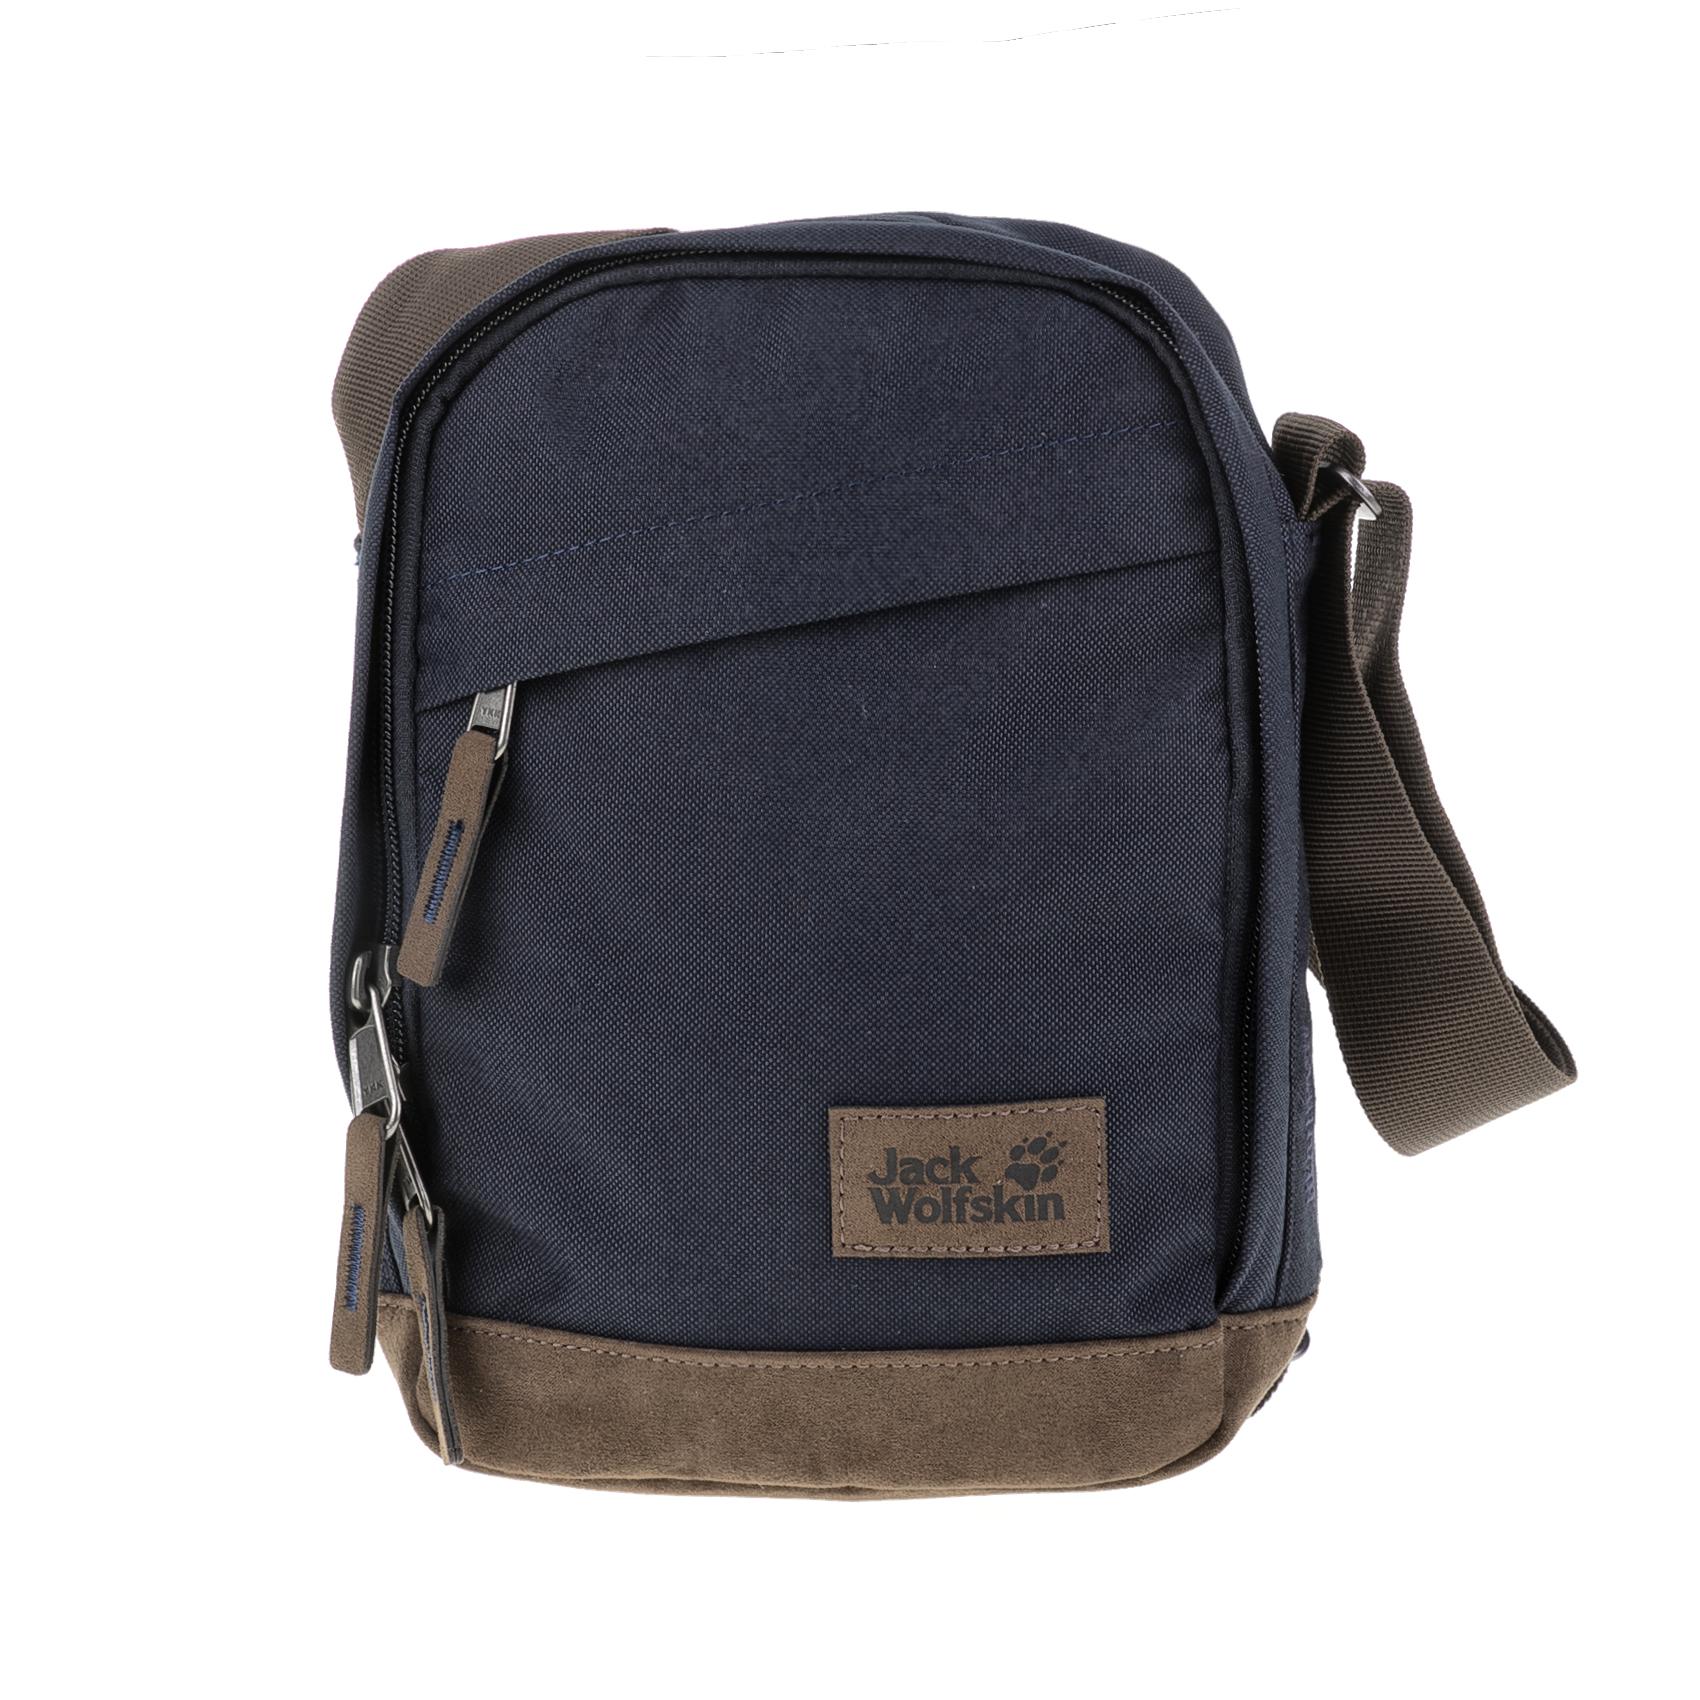 JACK WOLFSKIN – Τσαντάκι ώμου HEATHROW SHOULDER BAG EQUIPME JACK WOLFSKIN μπλε-καφέ 1635935.0-1100